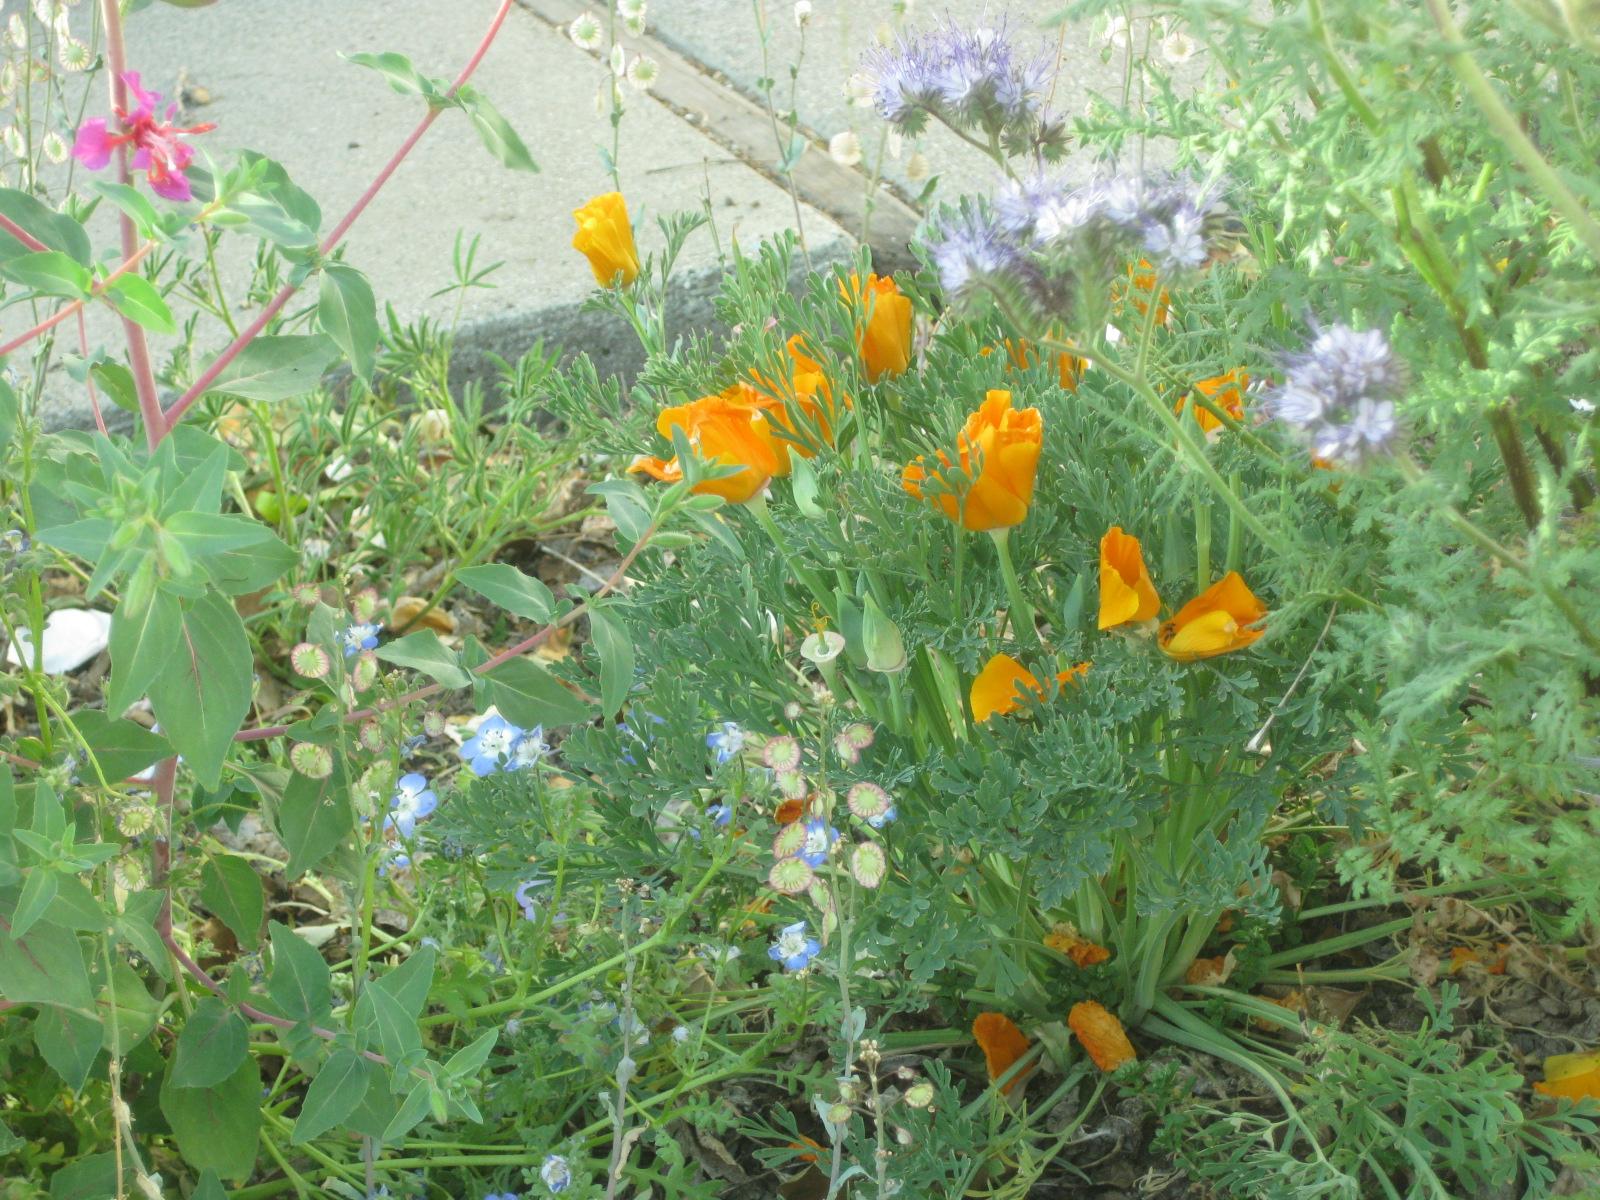 California poppies, phacelia, clarkia